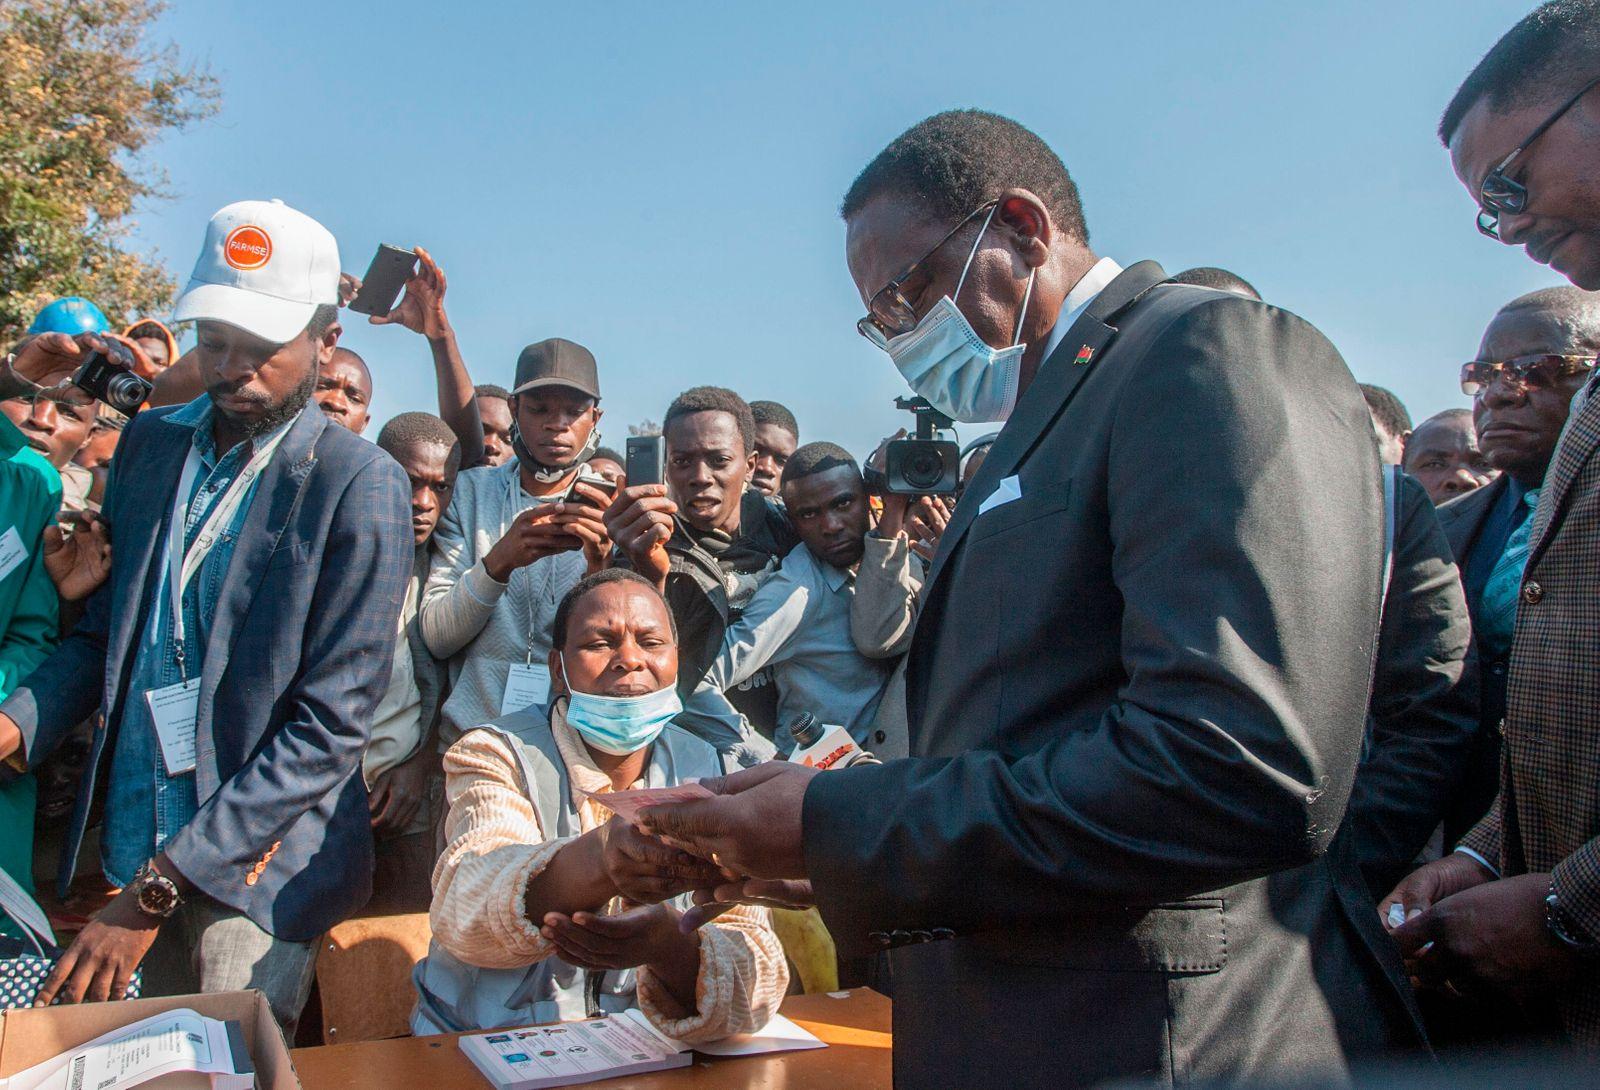 MALAWI-POLITICS-VOTE